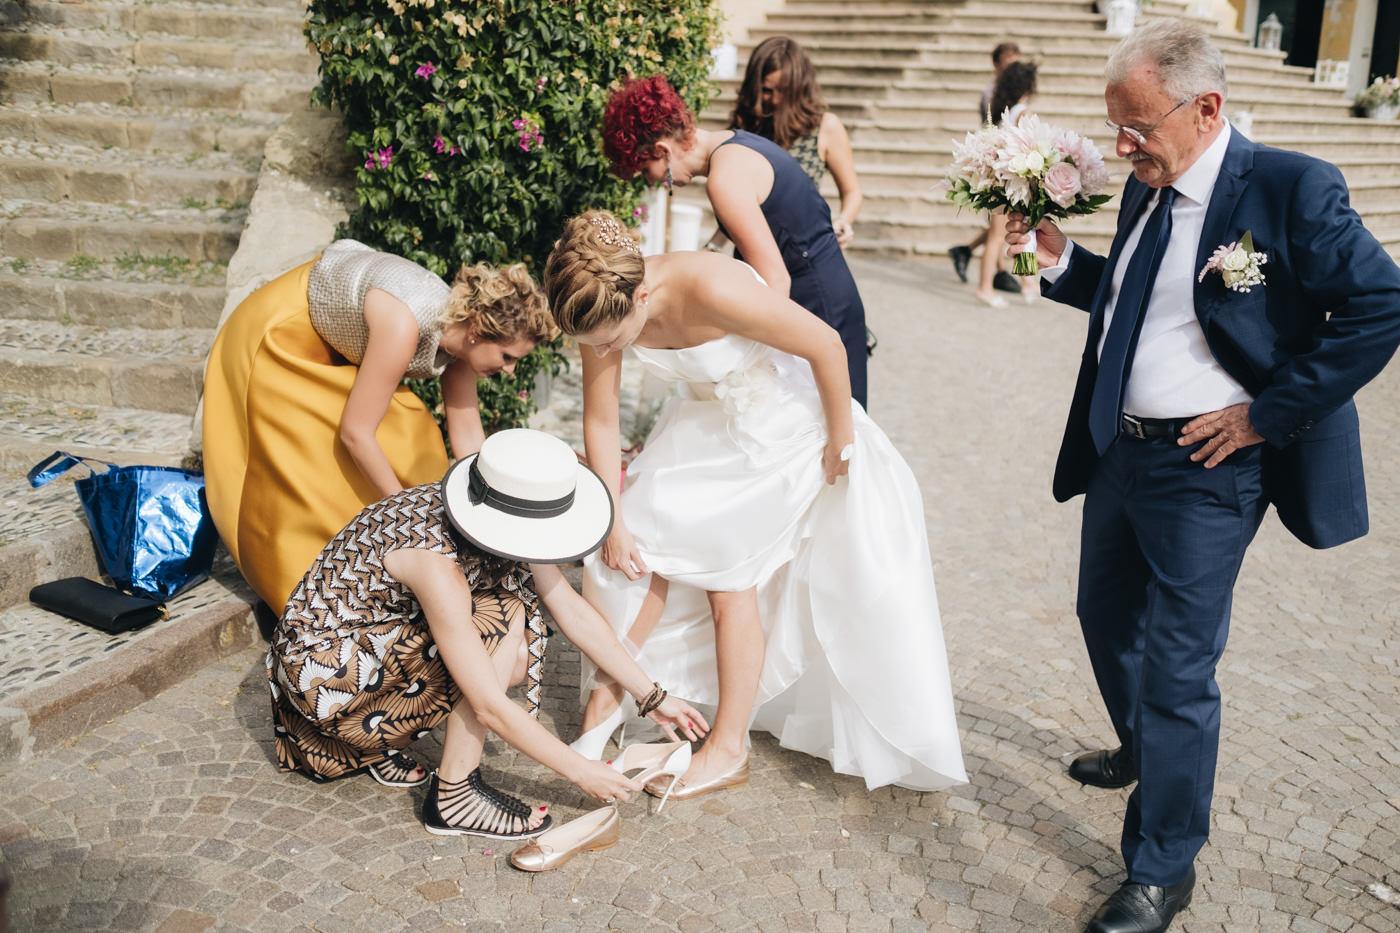 matrimoni_all_italiana_fotografo_matrimonio_cinque_terre-19.jpg